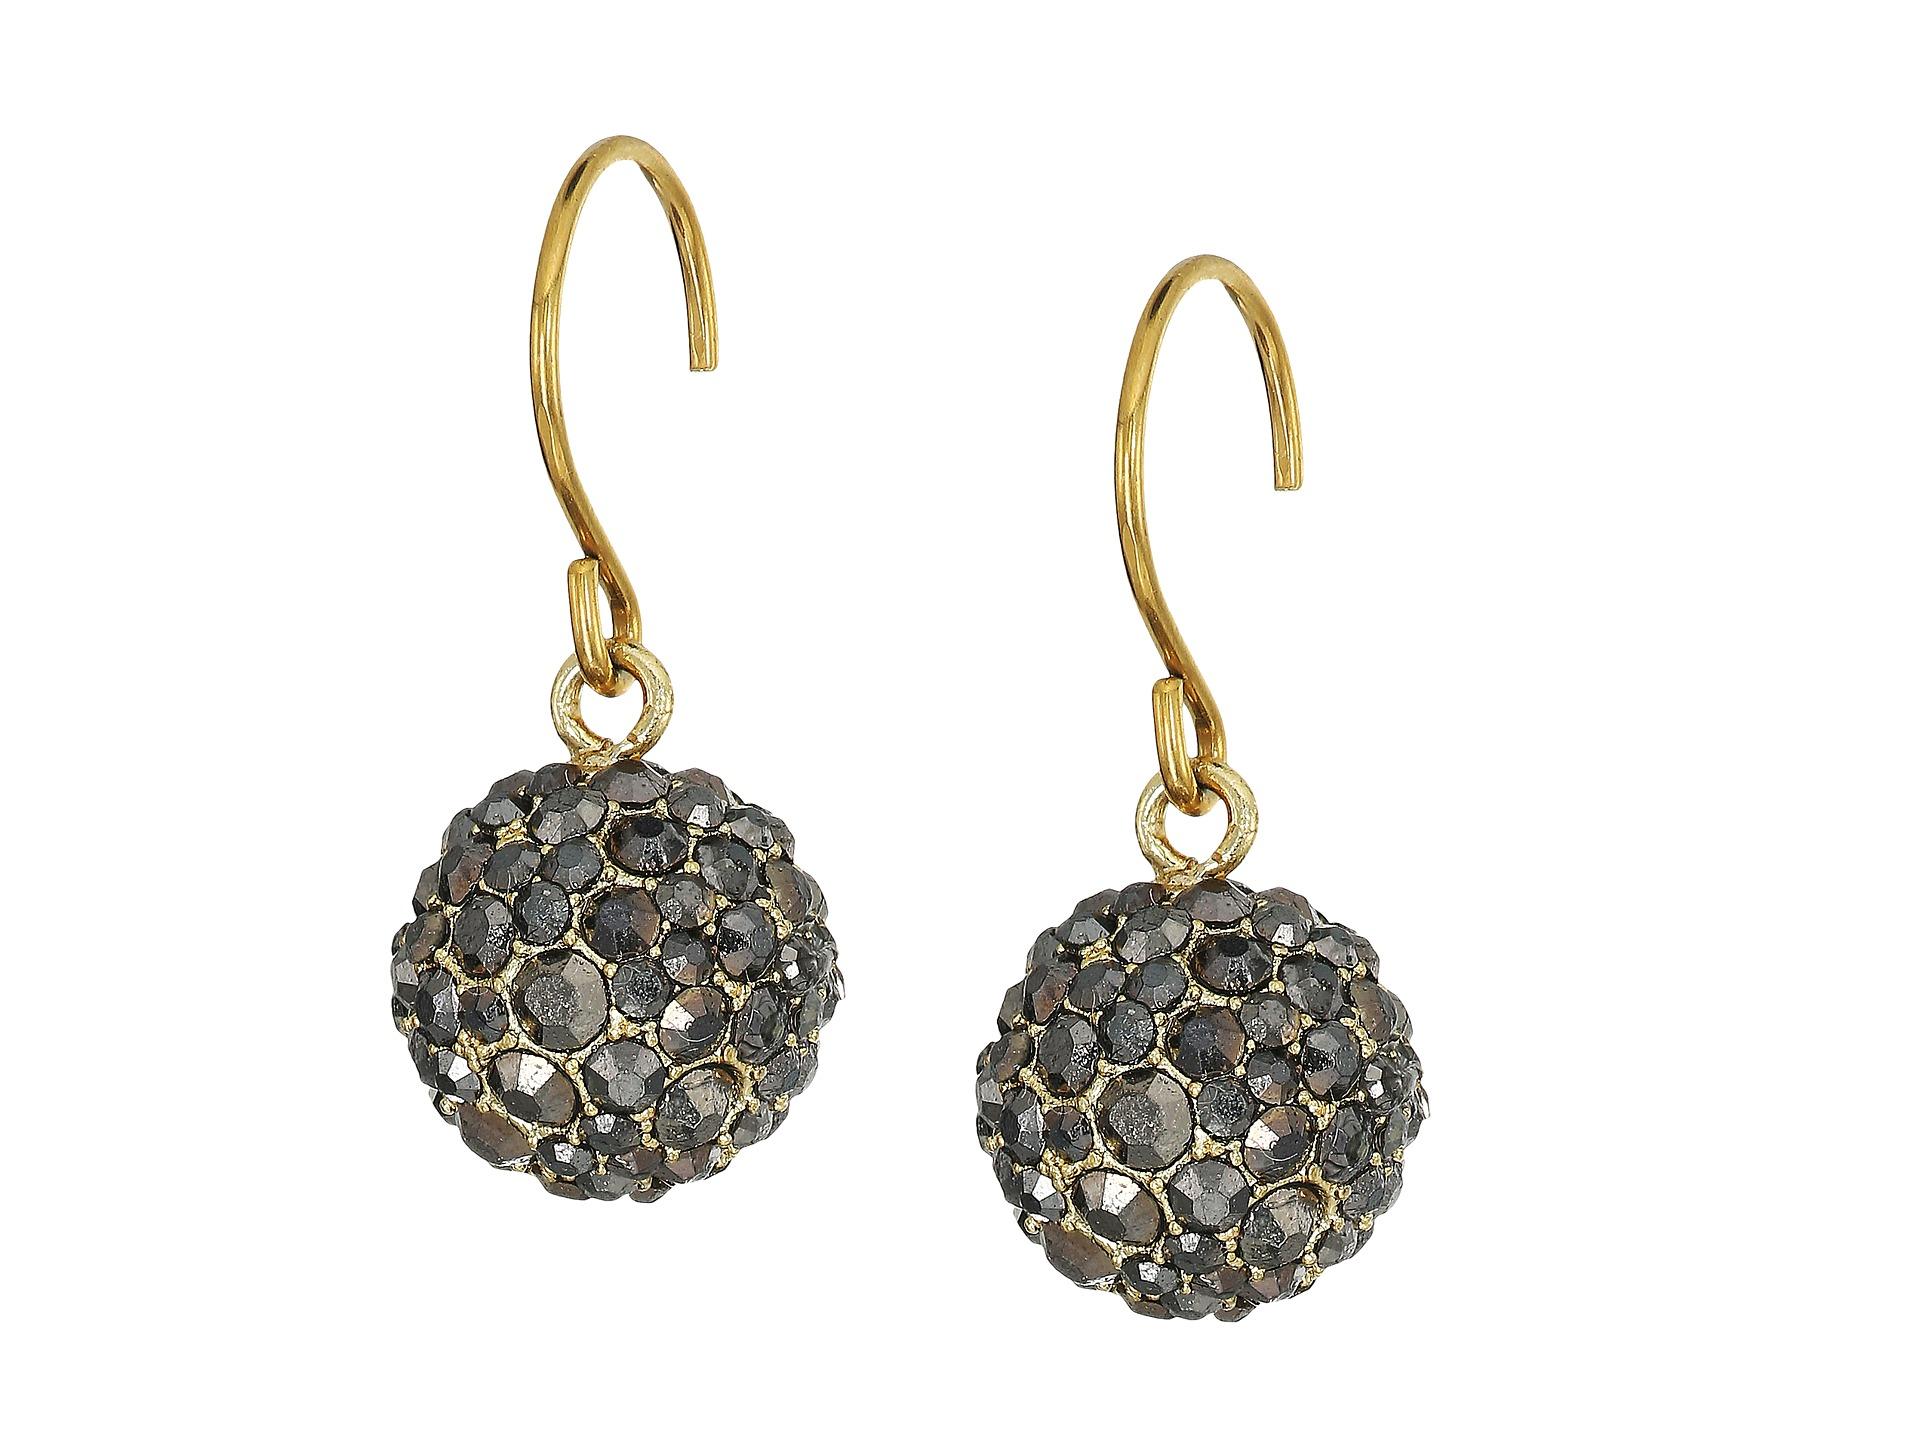 vera bradley radiant fireball drop earrings at zappos